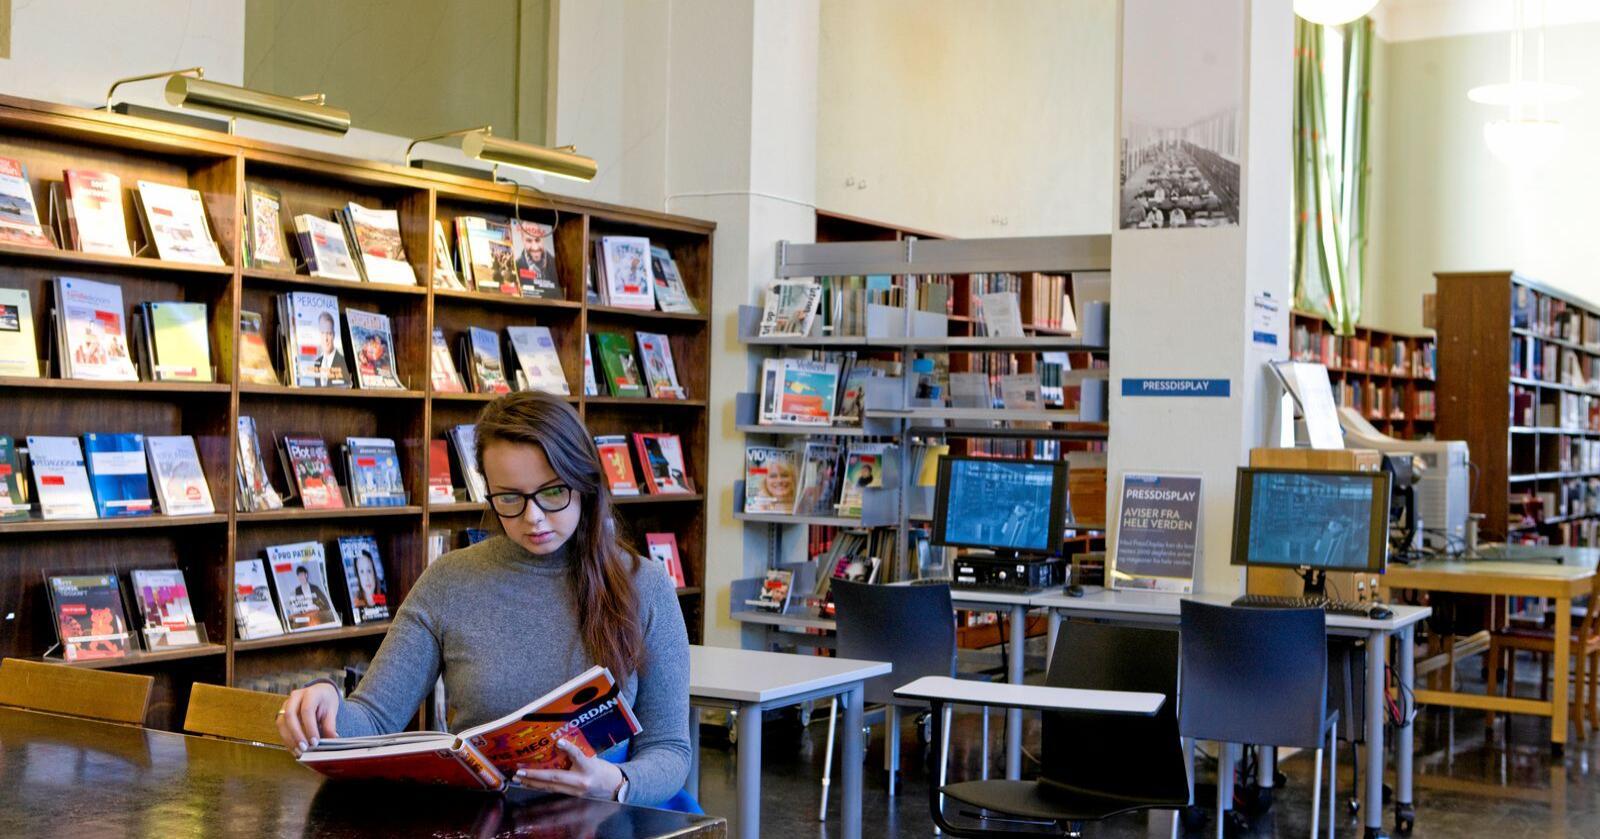 Utdanning: Kronikk-forfatteren skriver at stadig mer forskning viser at utdanning nå skaper nye klasseskiller. Foto: Thomas Brun / NTB scanpix